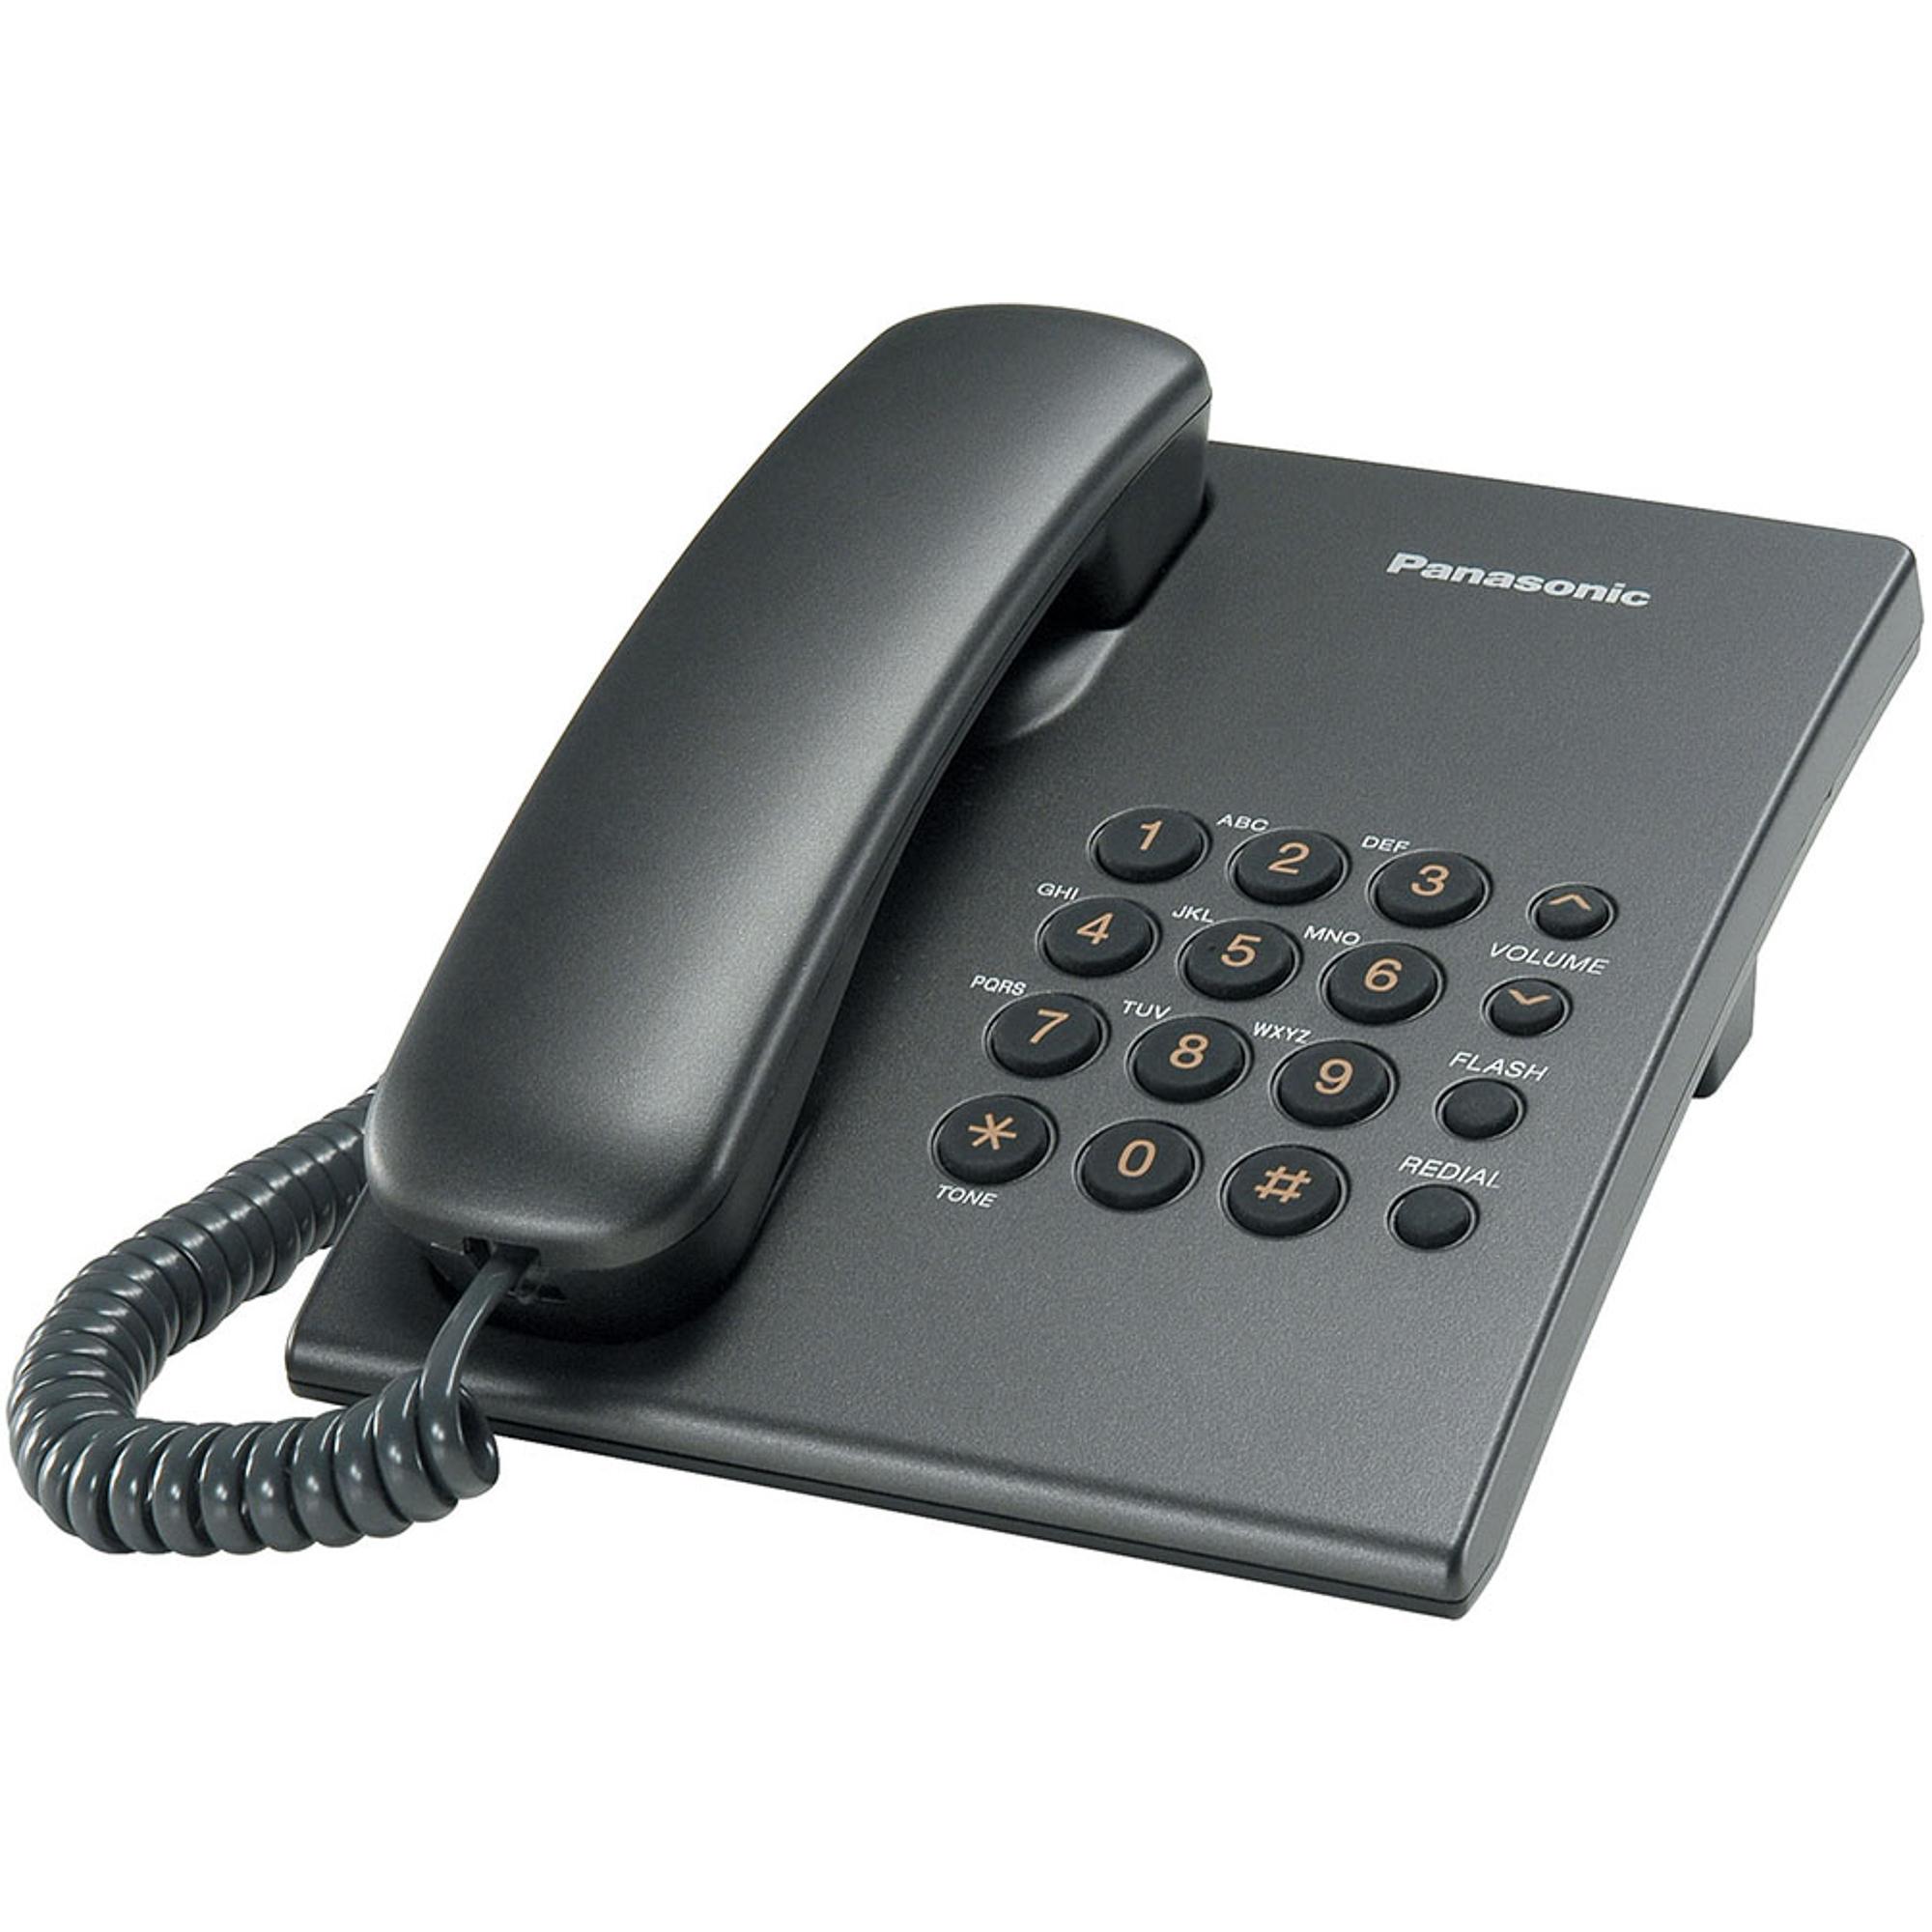 Стационарный телефон Panasonic KX-TS2350RUT